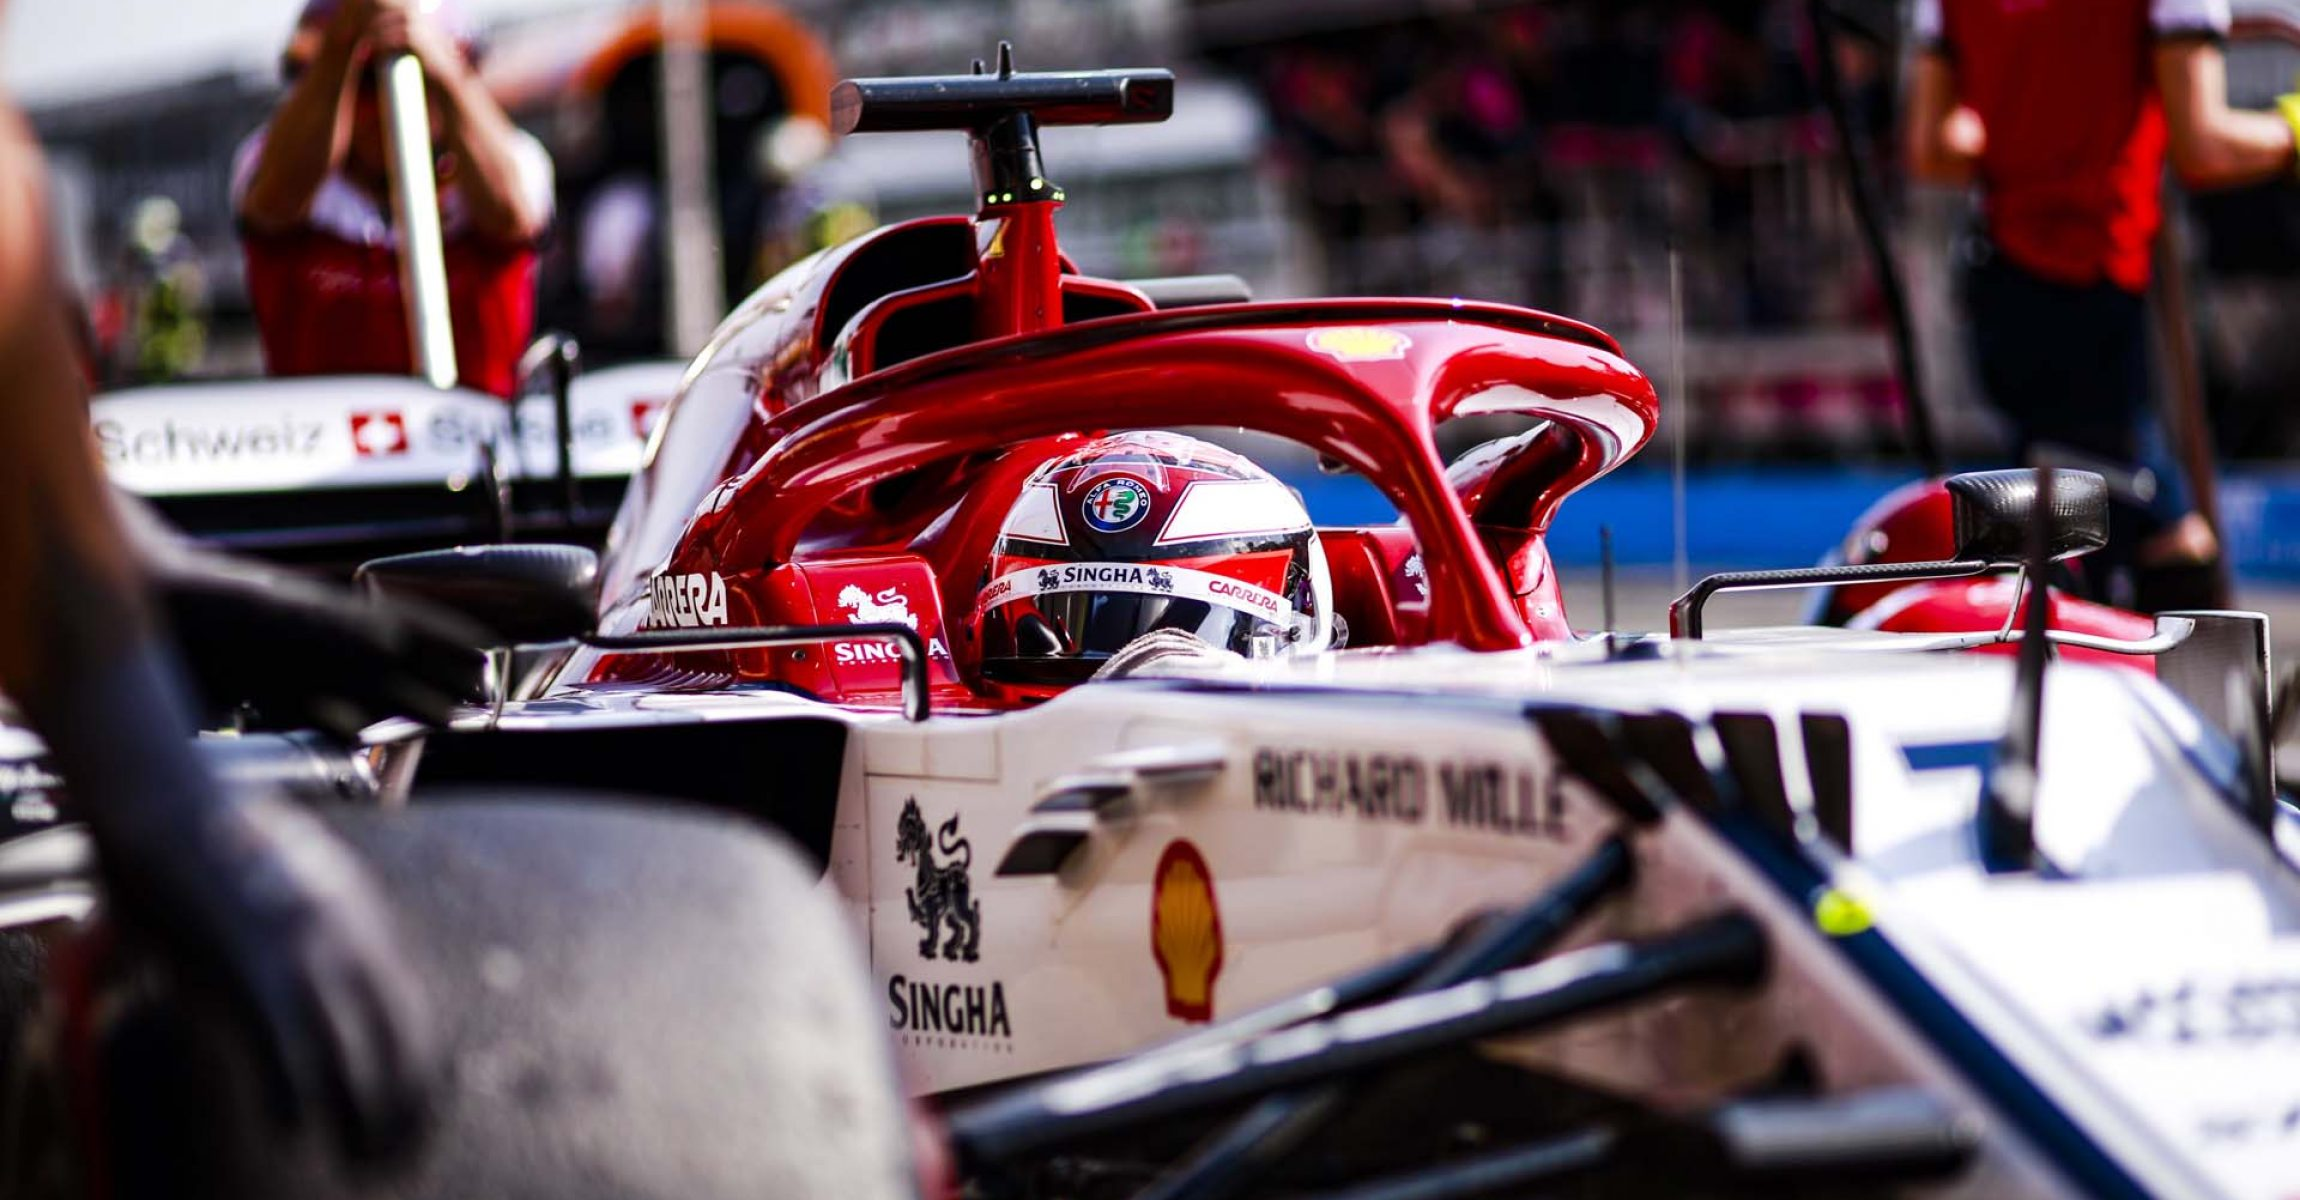 07 RAIKKONEN Räikkönen Kimi (fin), Alfa Romeo Racing C38, action during the 2019 Formula One World Championship, Germany Grand Prix from July 25 to 28, in Hockenheim, Germany - Photo Xavi Bonilla / DPPI